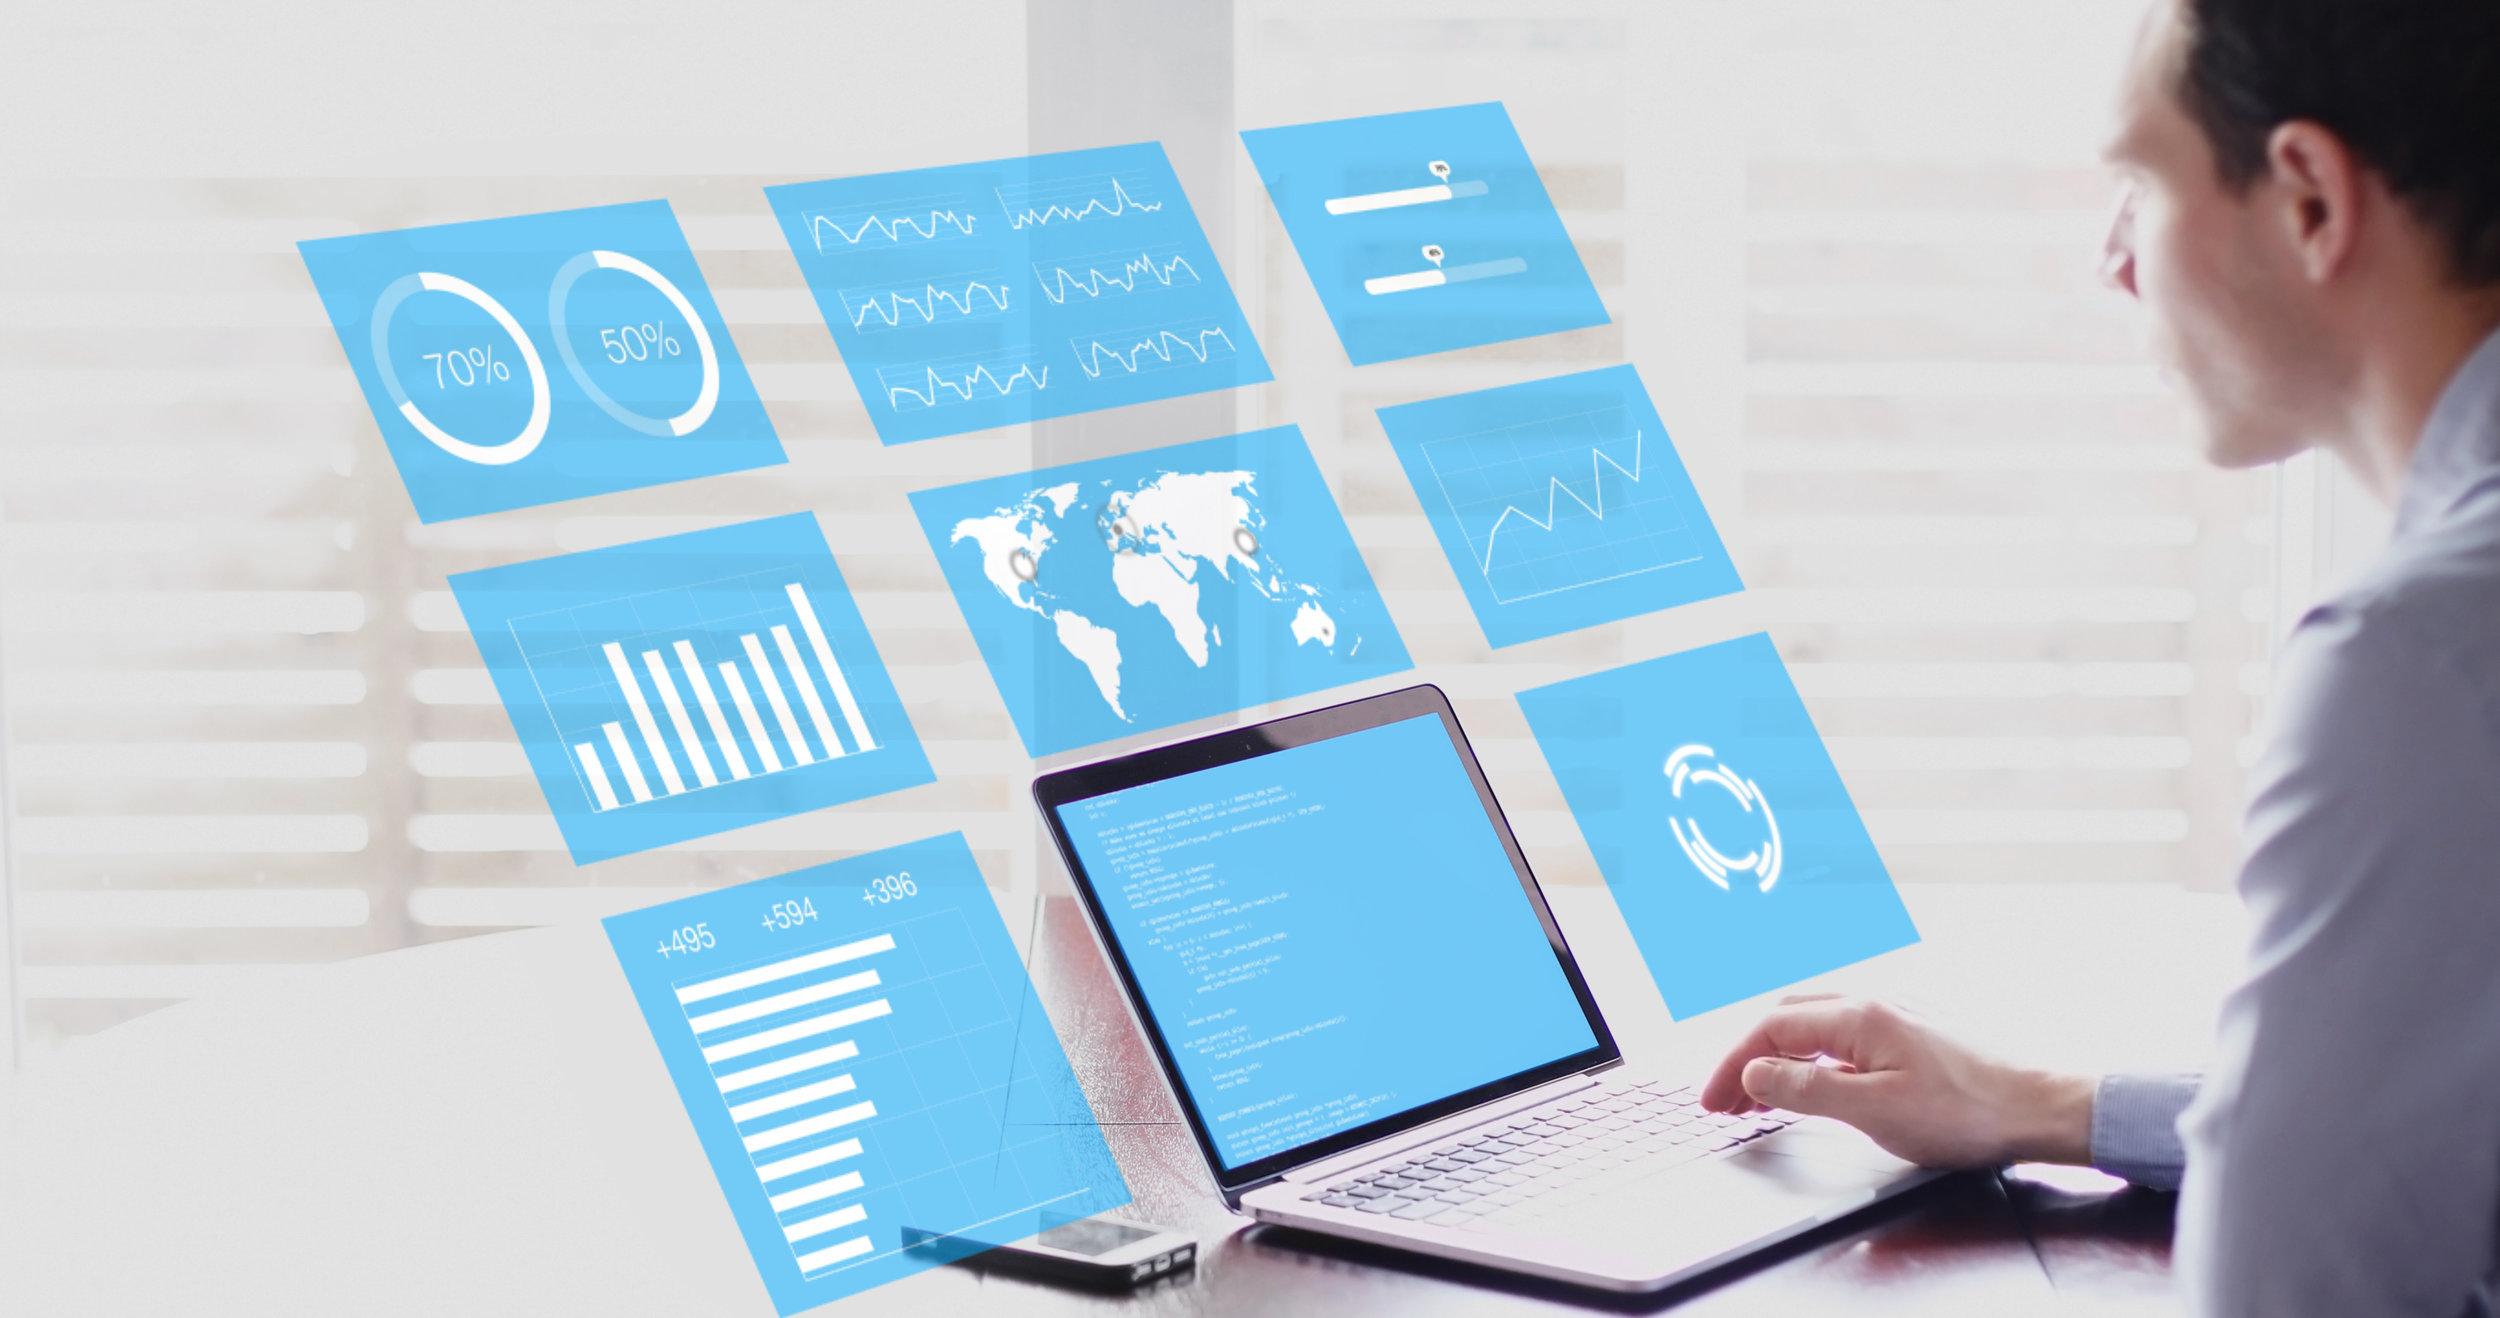 Key Performance Indicators (KPI) on business dashboard, businessman analyzing metrics